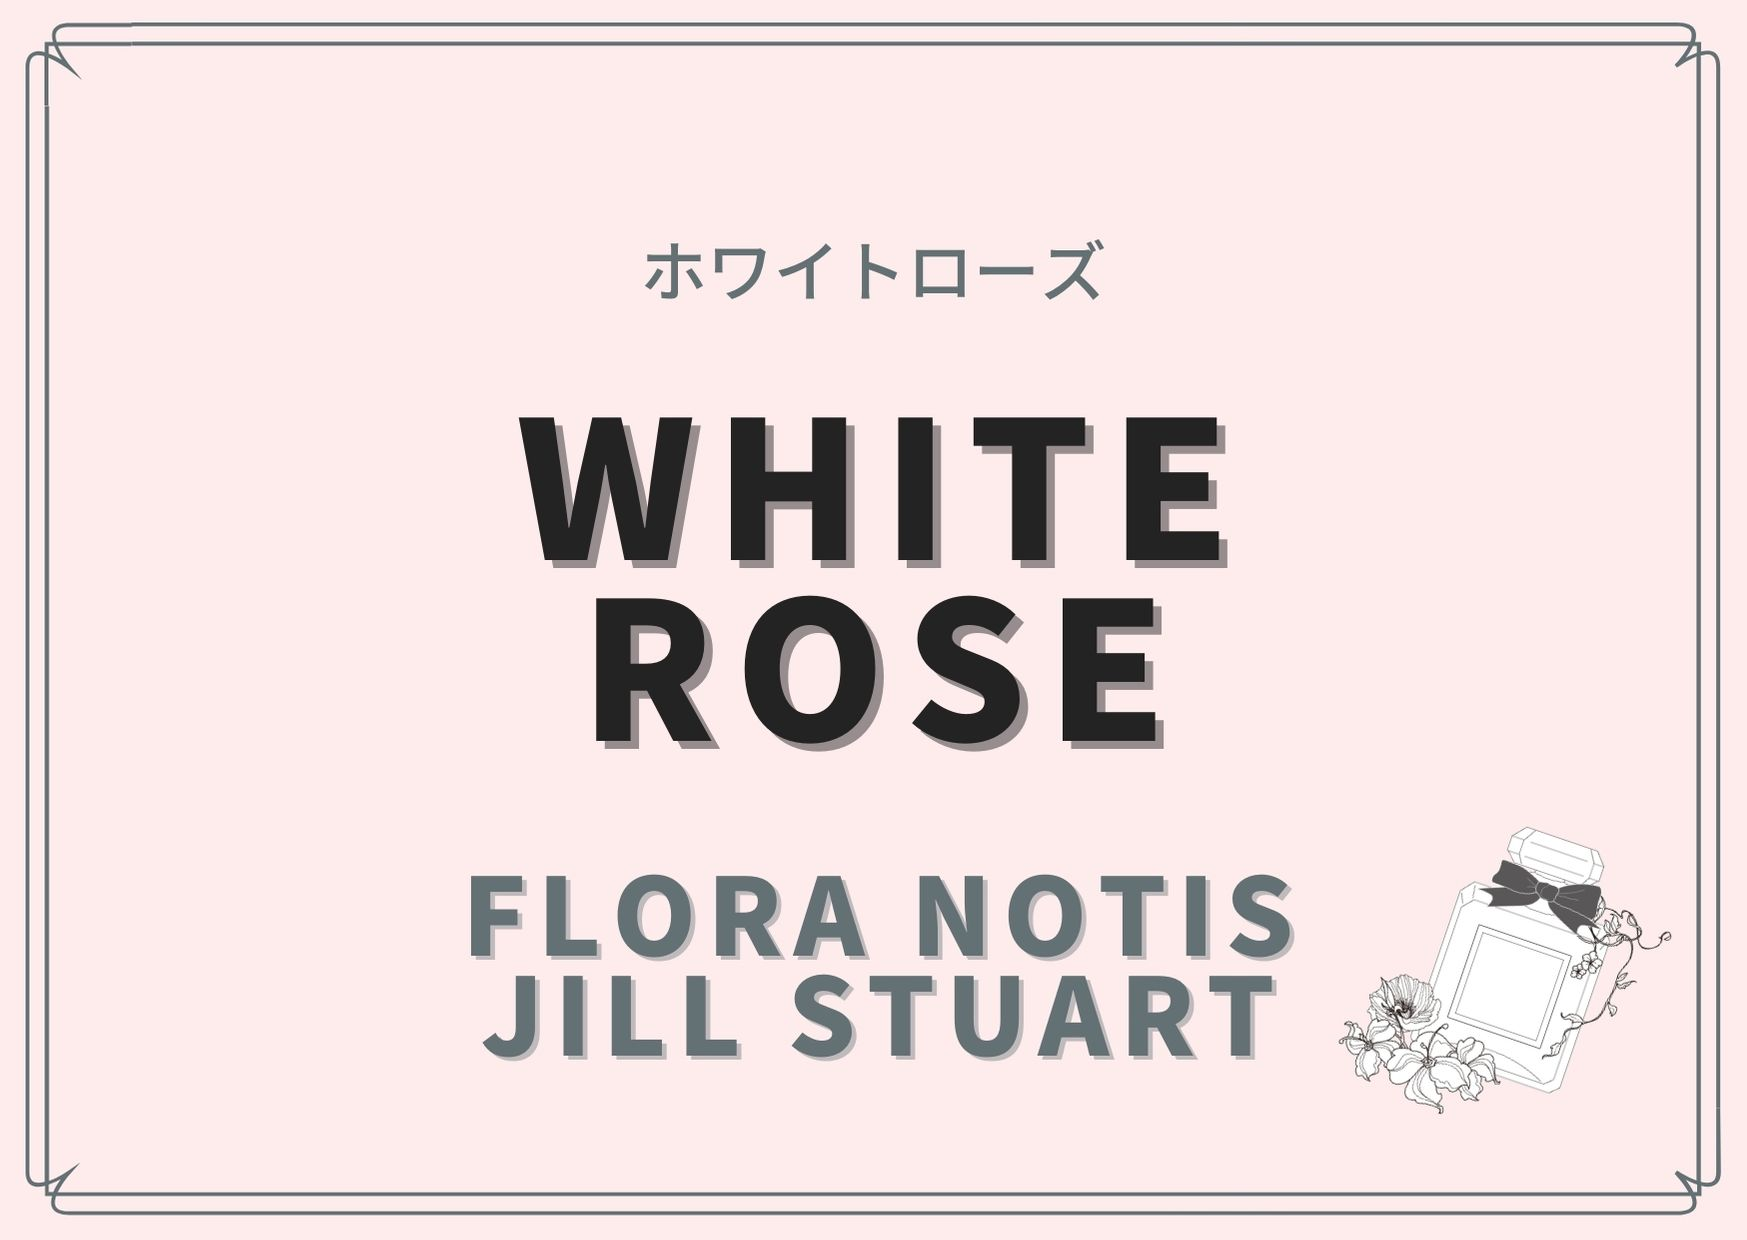 White Rose(ホワイトローズ)/Flora Notis JILL STUART